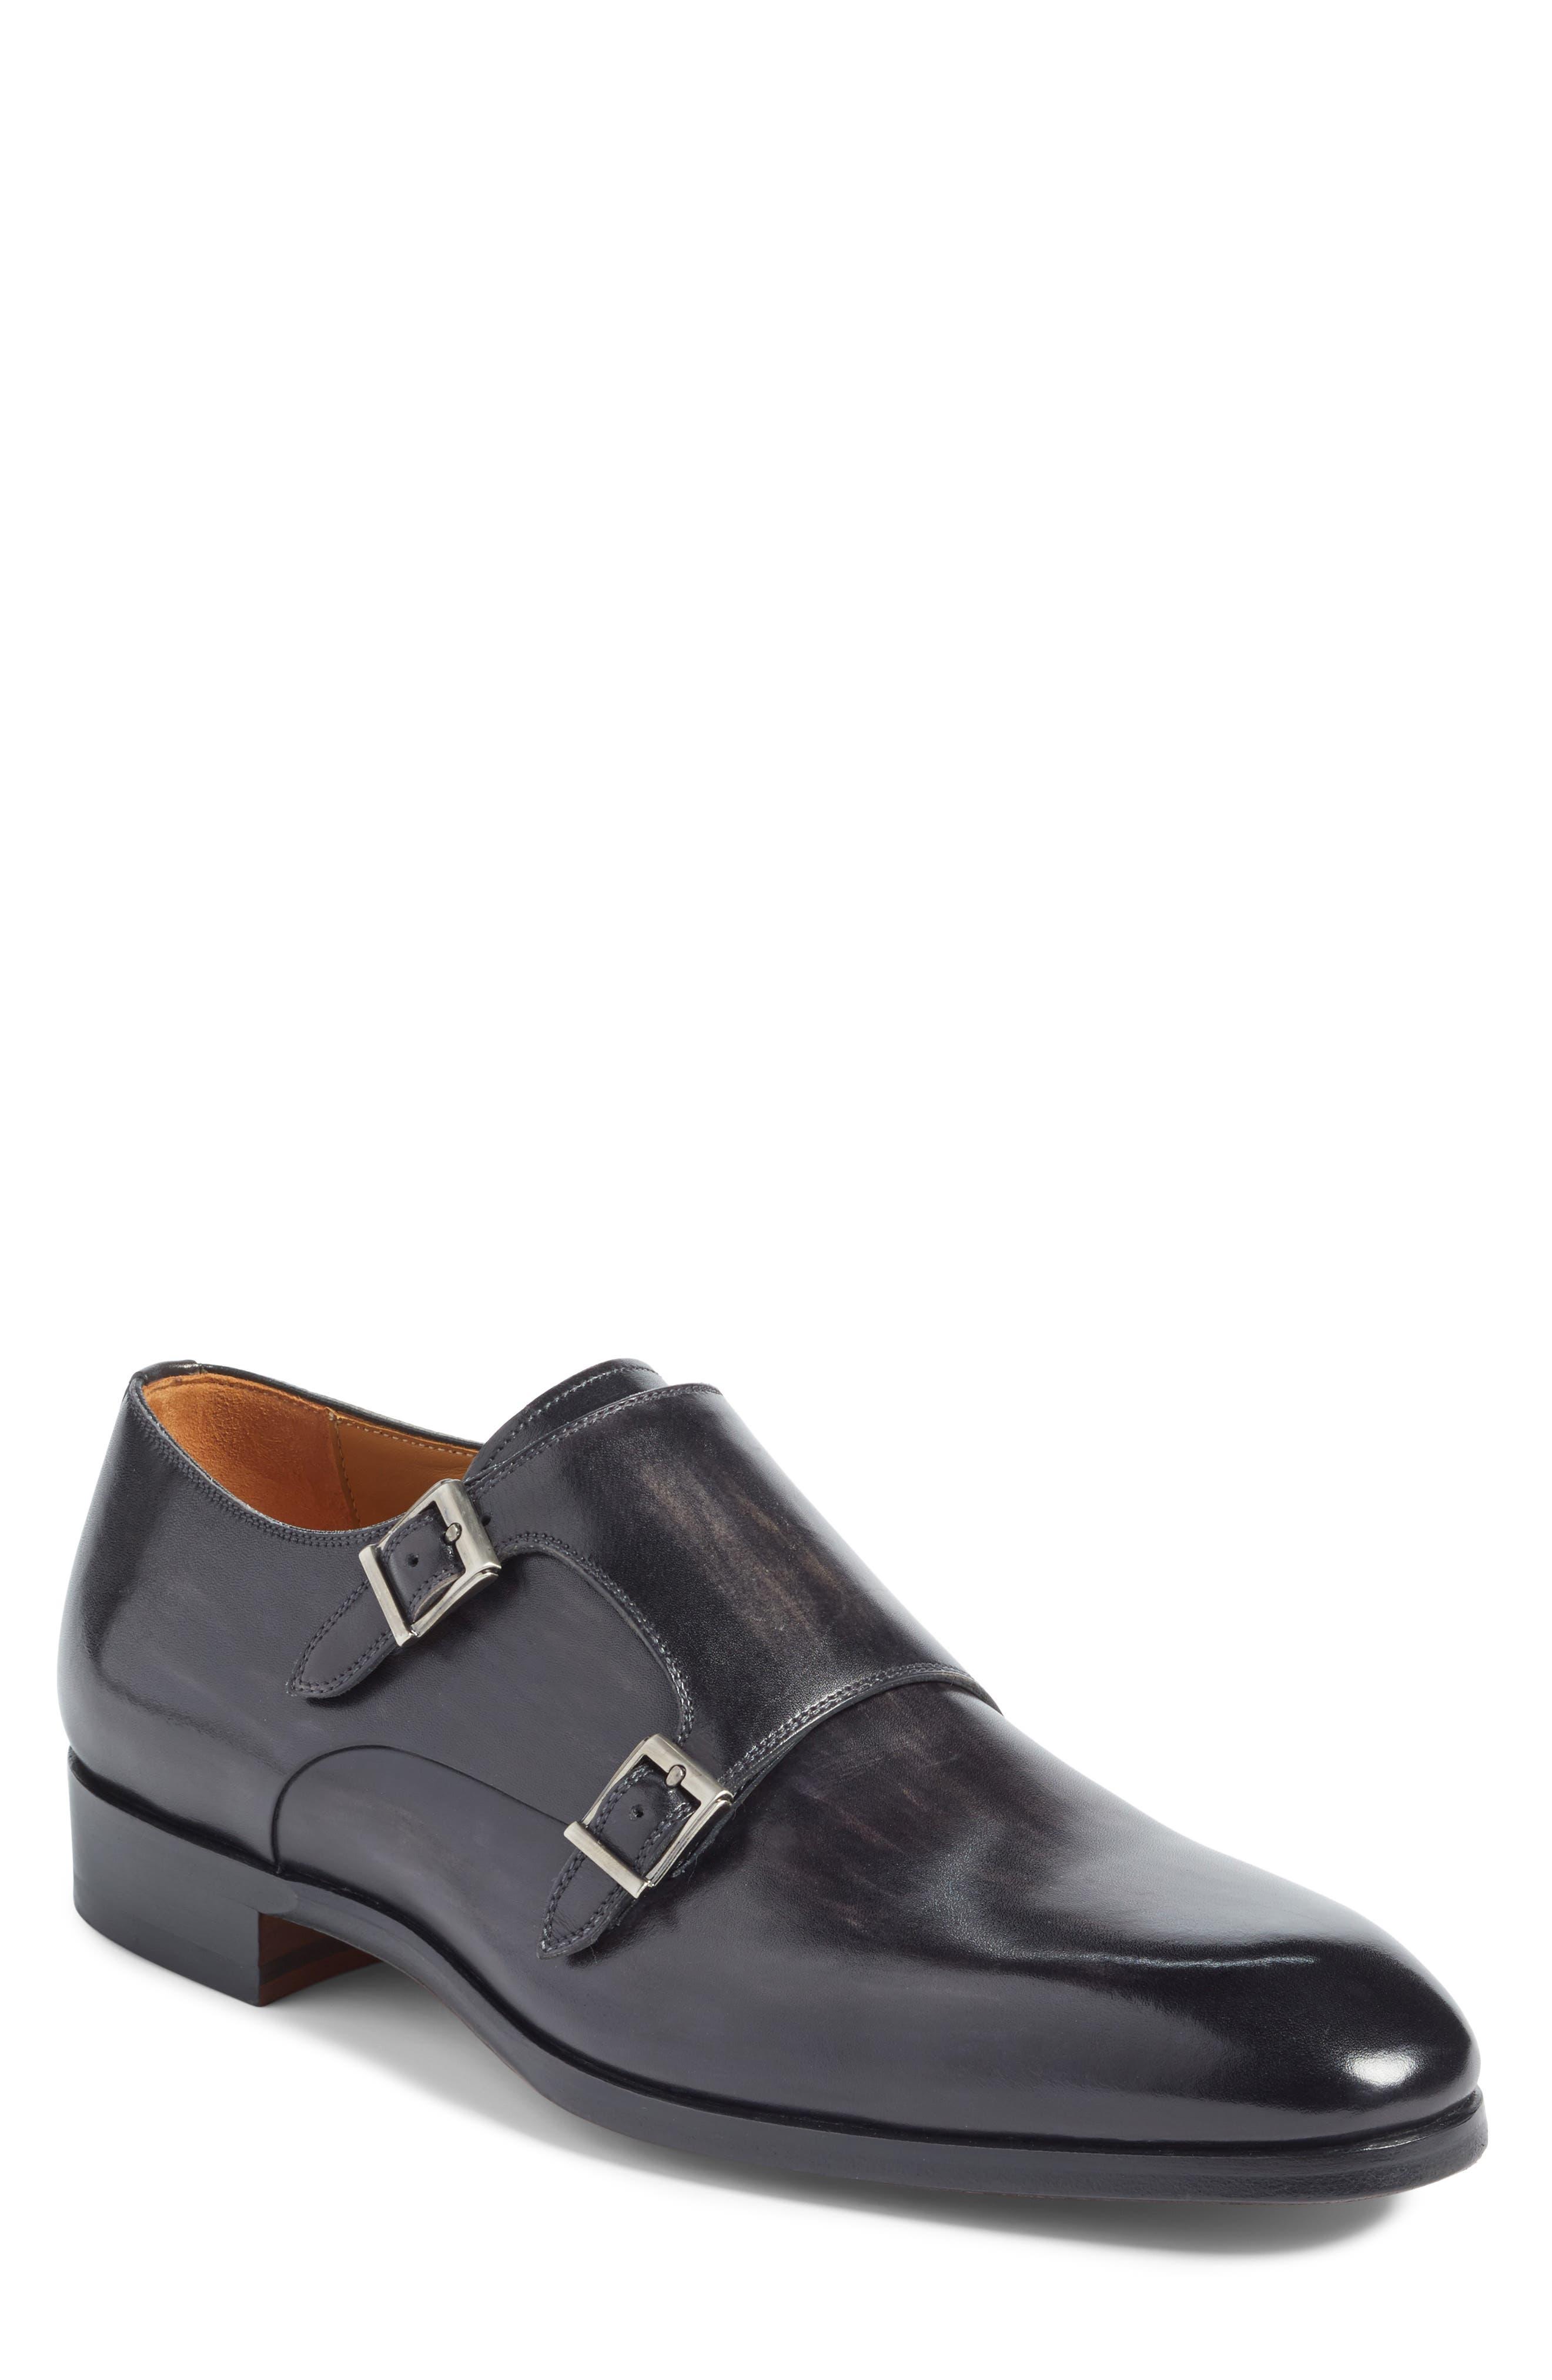 Lucio Double Strap Monk Shoe,                             Main thumbnail 1, color,                             Light Grey Leather